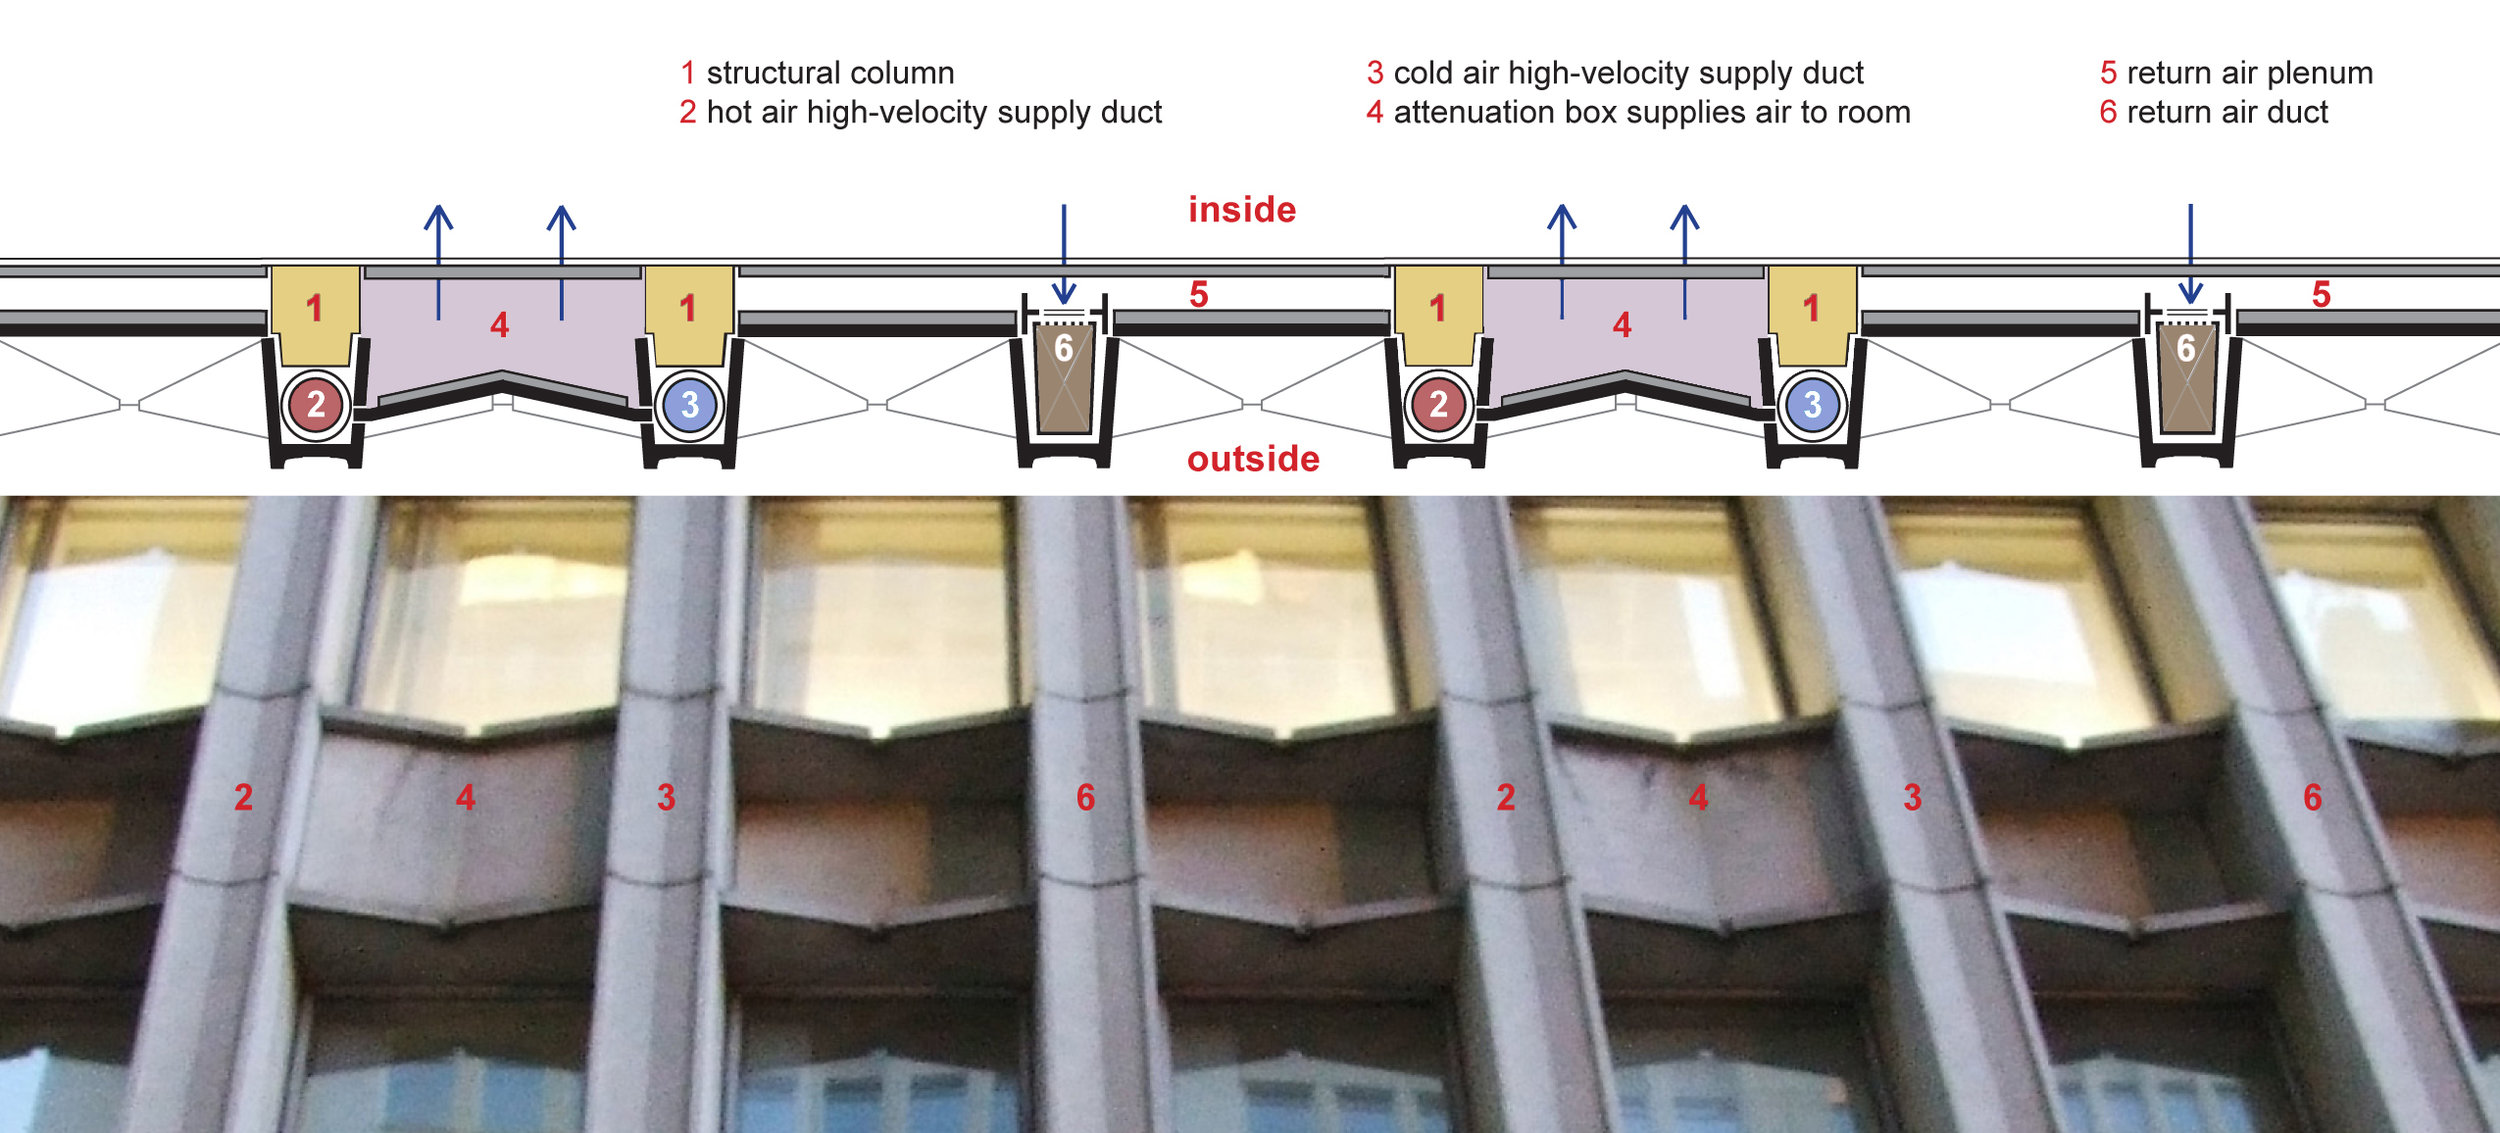 Bluecross Blueshield Office Building Architecture To 19facadeventilationsystem Alternatives To Demolition Paul Rudolphu0027s Blue Cross Shield